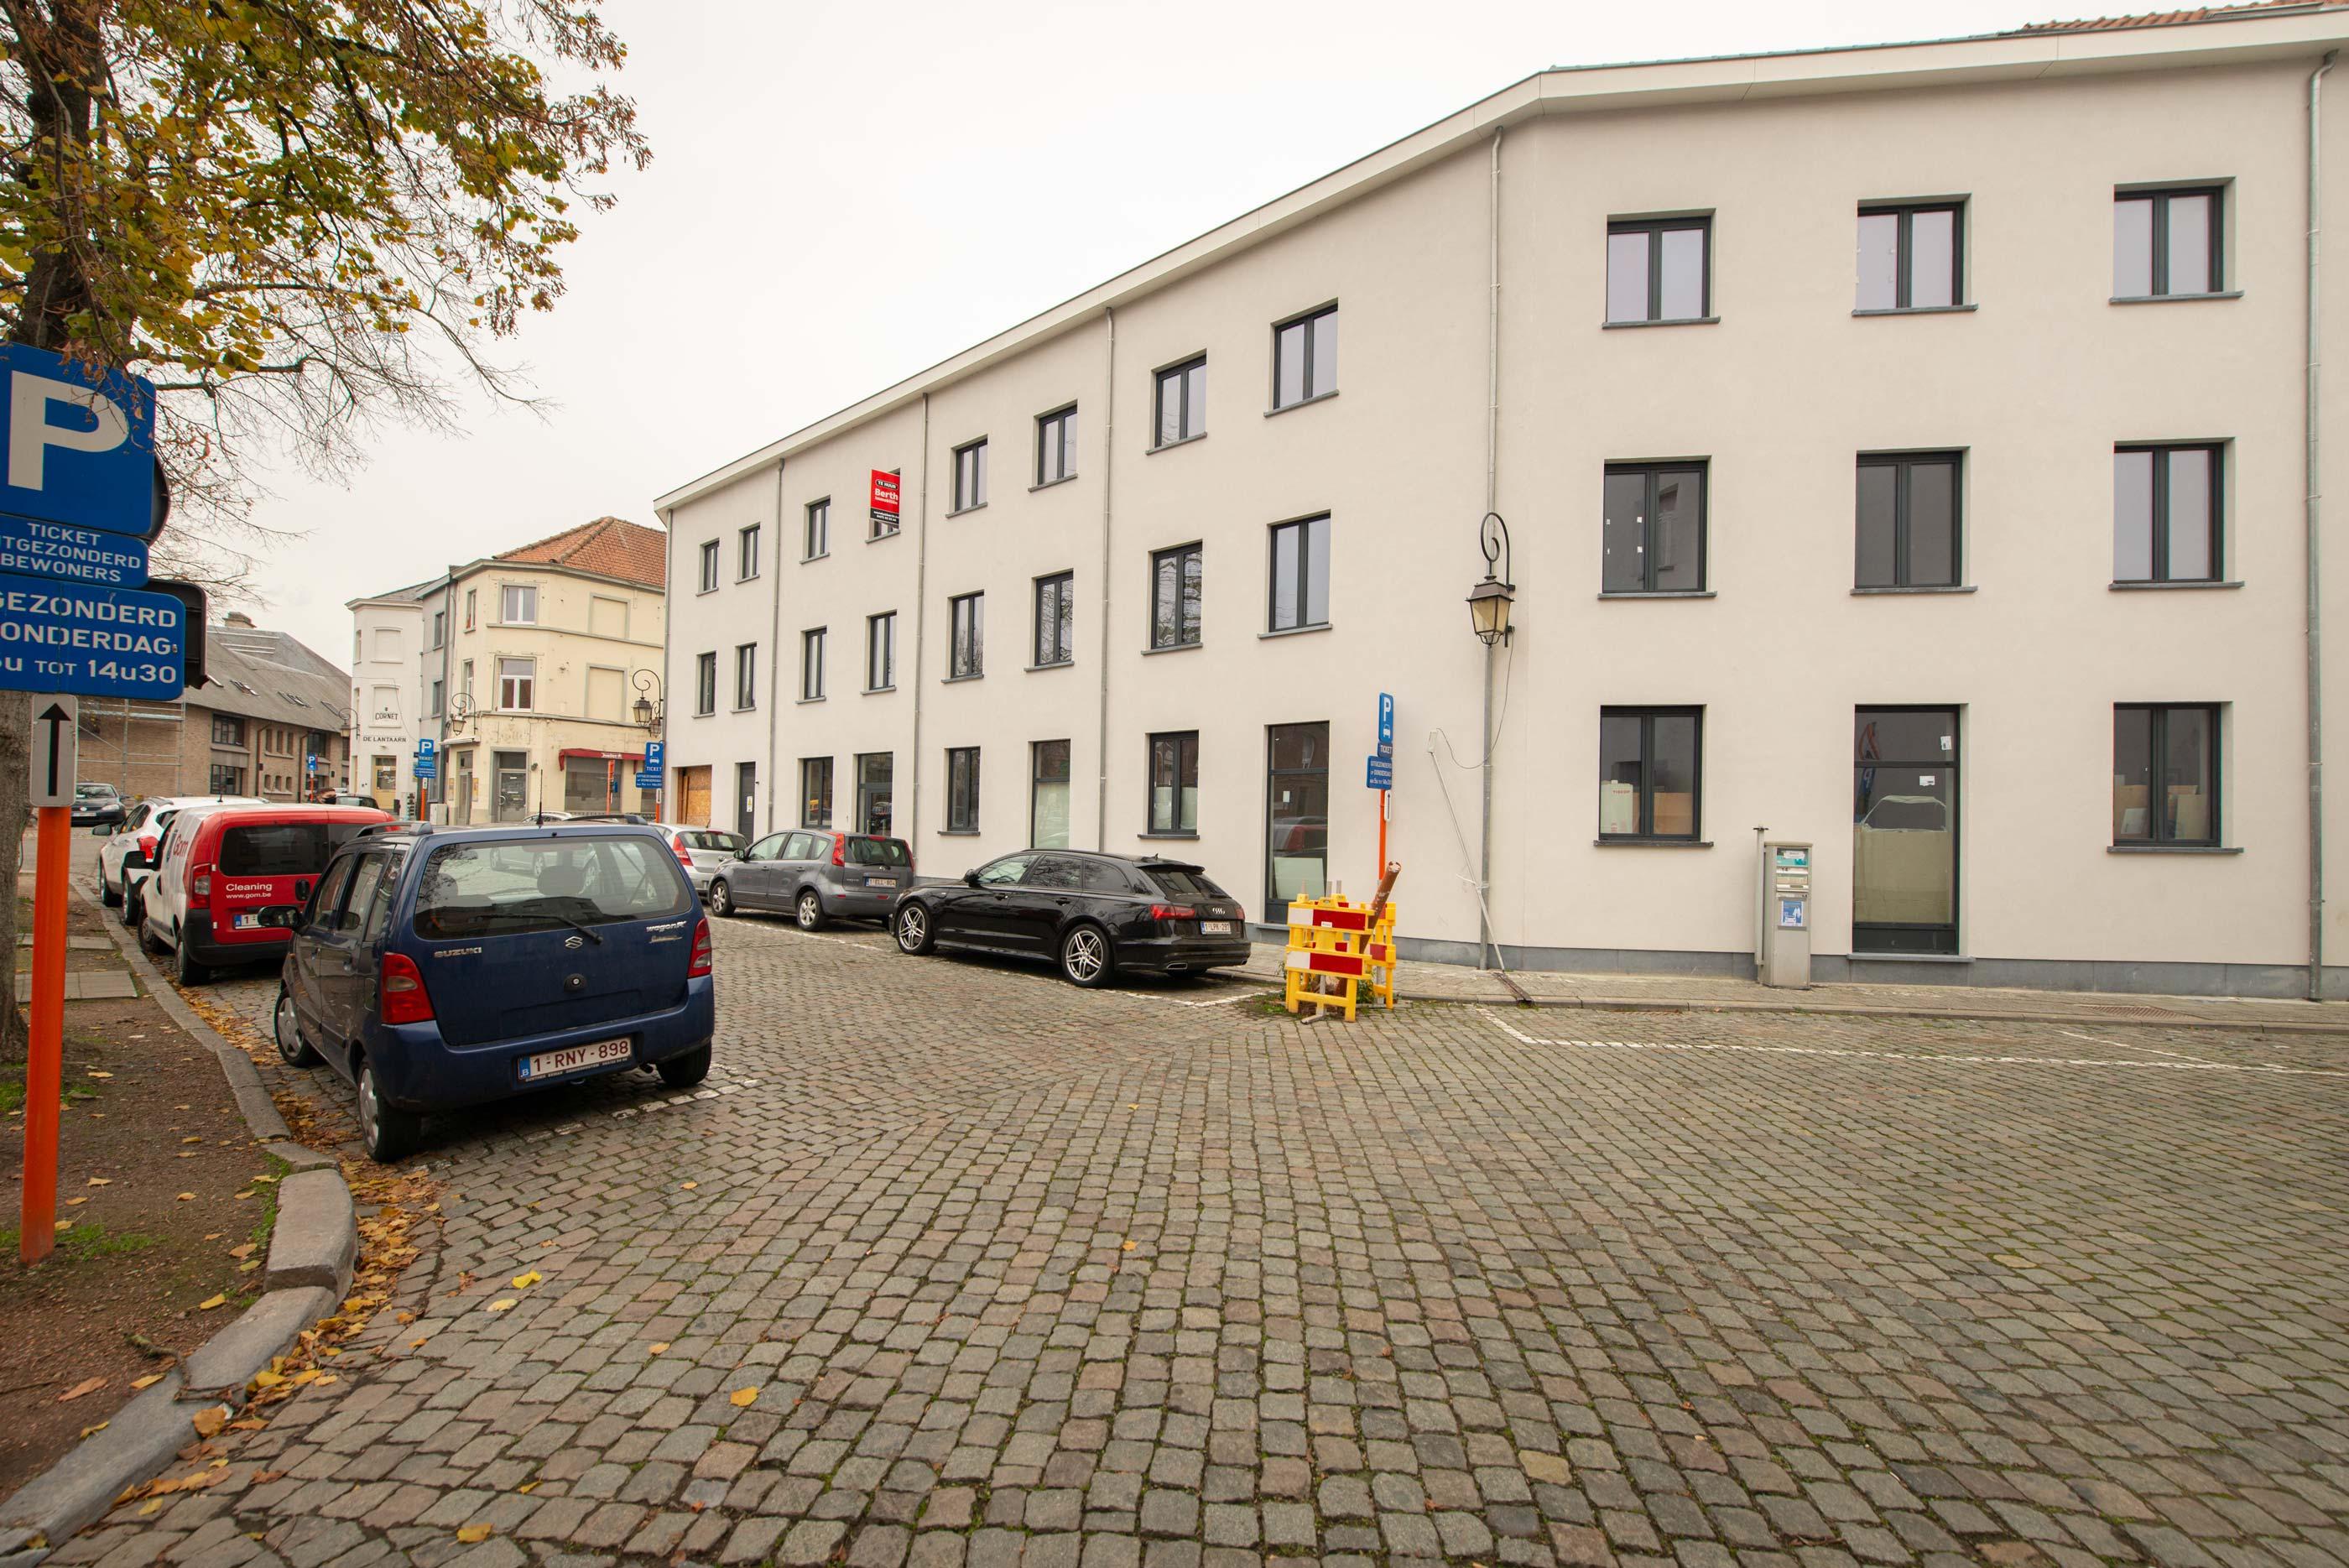 Oudstrijdersplein 1 app 1.2, 1500 Halle